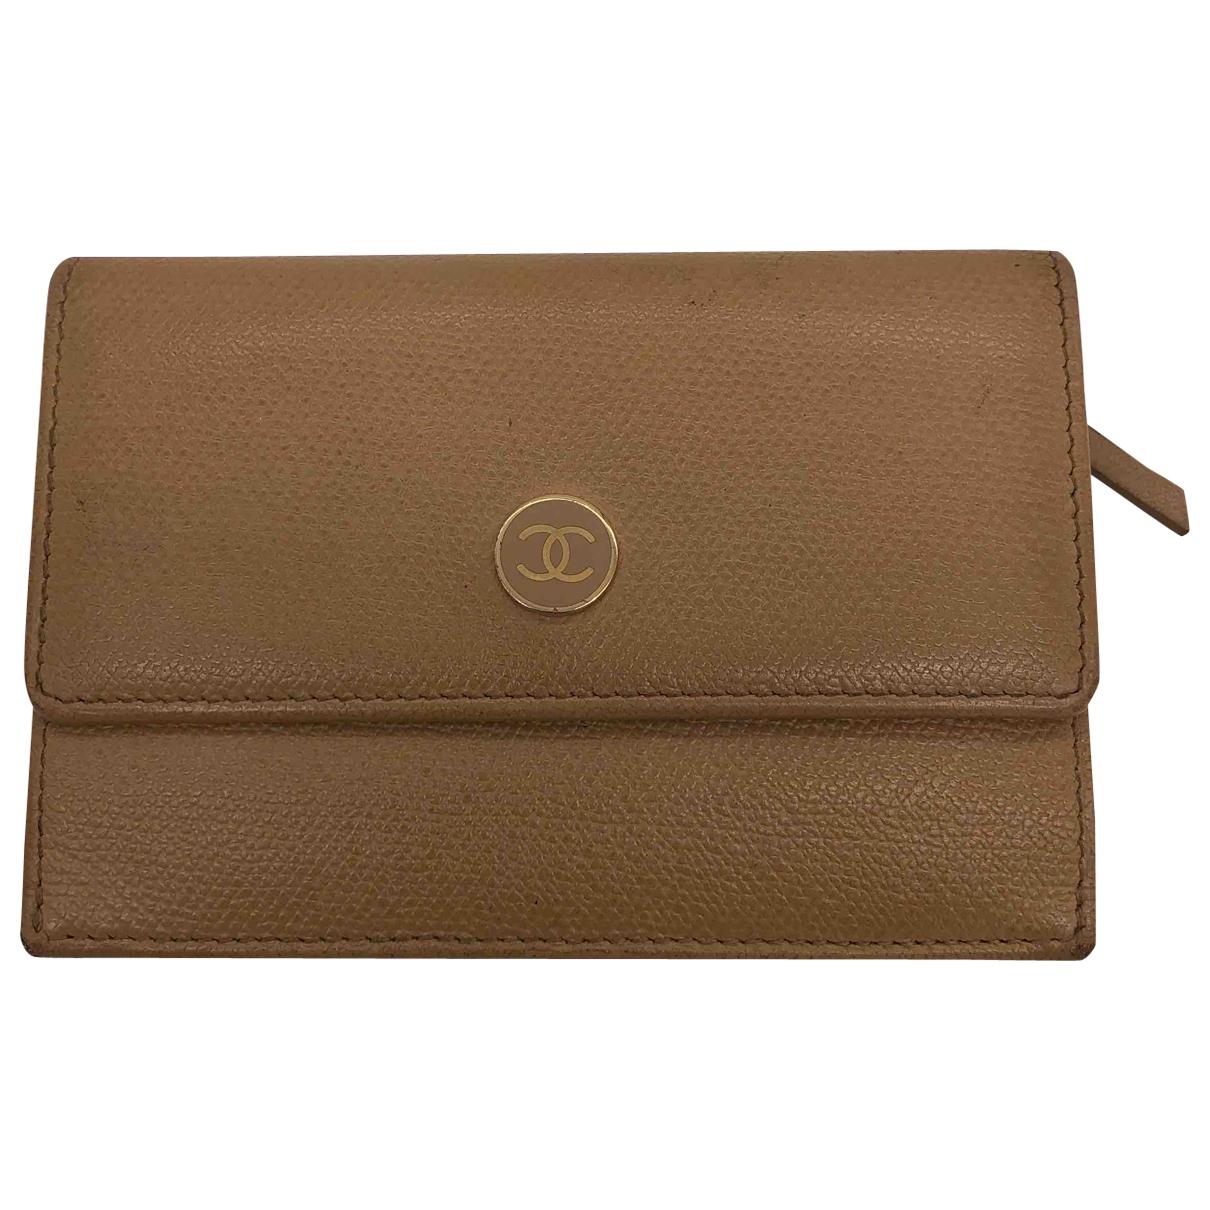 Chanel \N Camel Leather wallet for Women \N